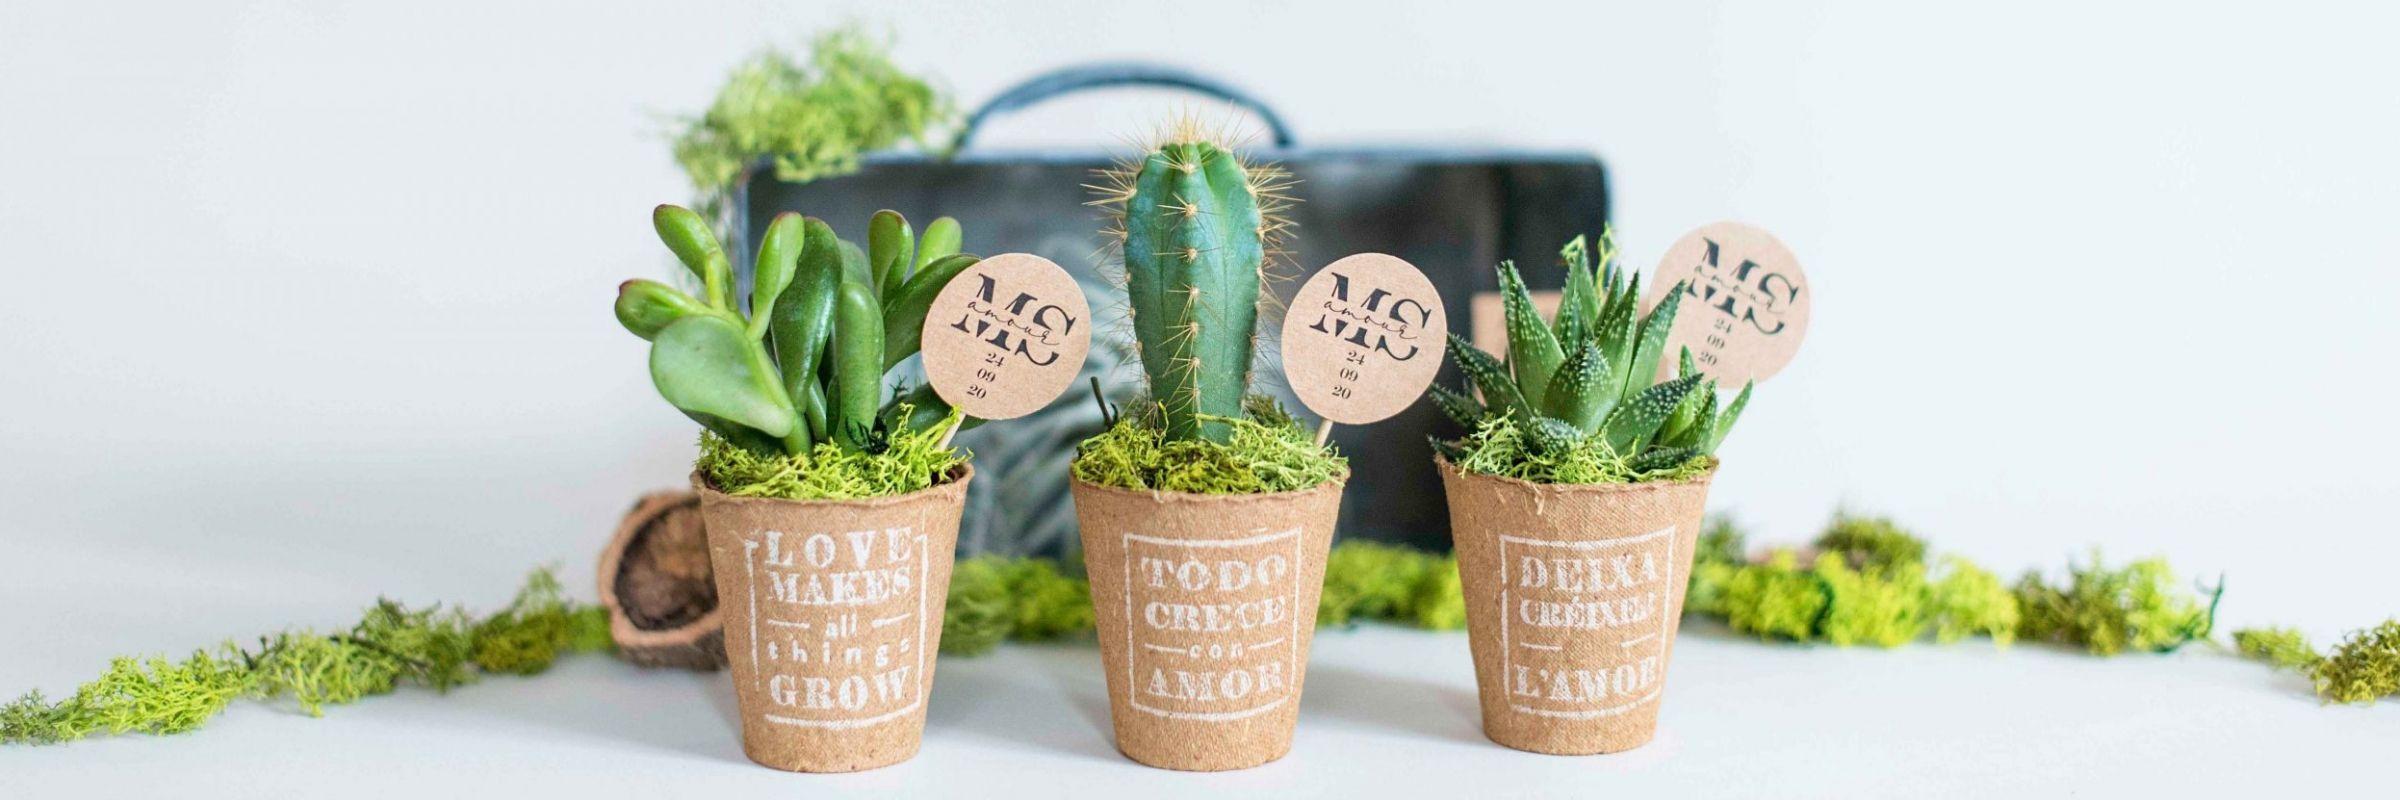 2020_01_17_miranda_green_mini_cactus_biodegradable_nuevo_estampado_idiomas_1